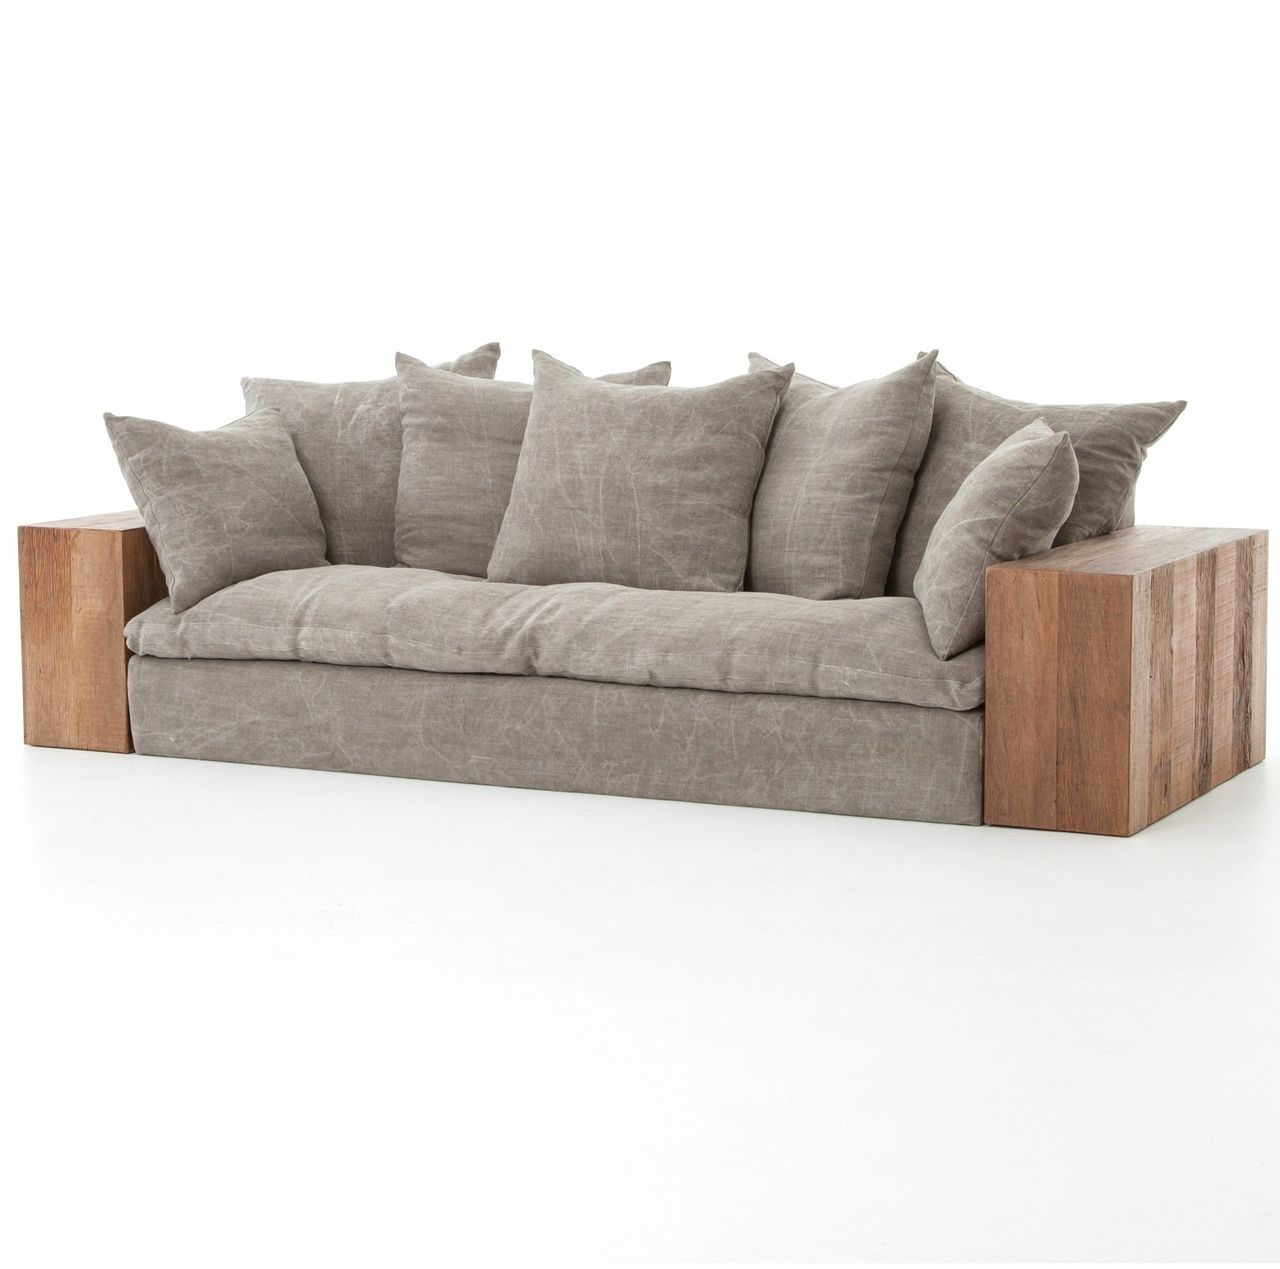 Dorset Industrial Loft Taupe Jute Sofa With Wood Arms Rustic Sofa Furniture Sofa